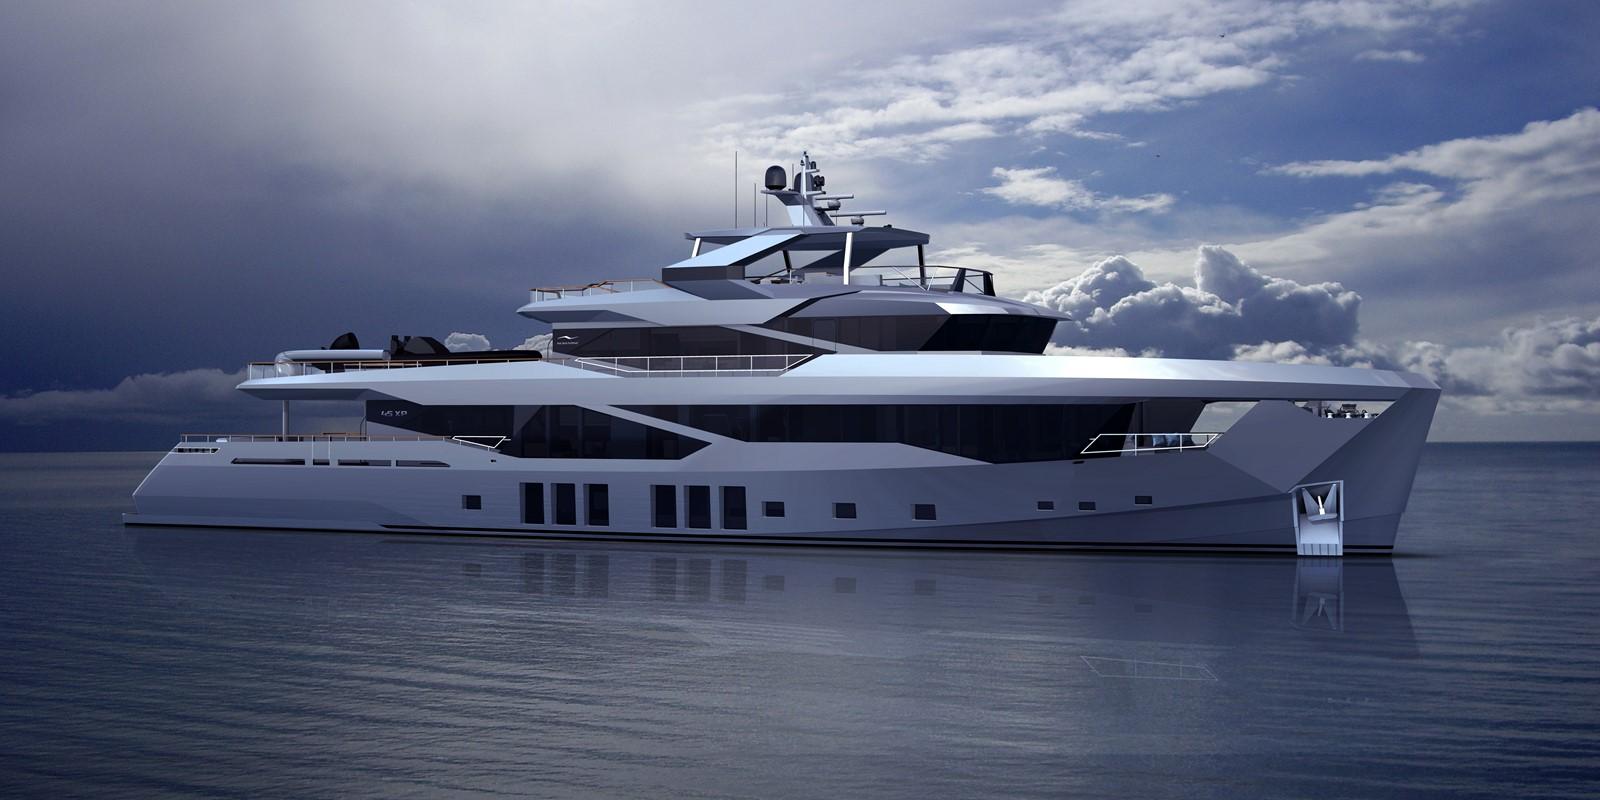 2021 NUMARINE 45XP Expedition Yacht 2551824